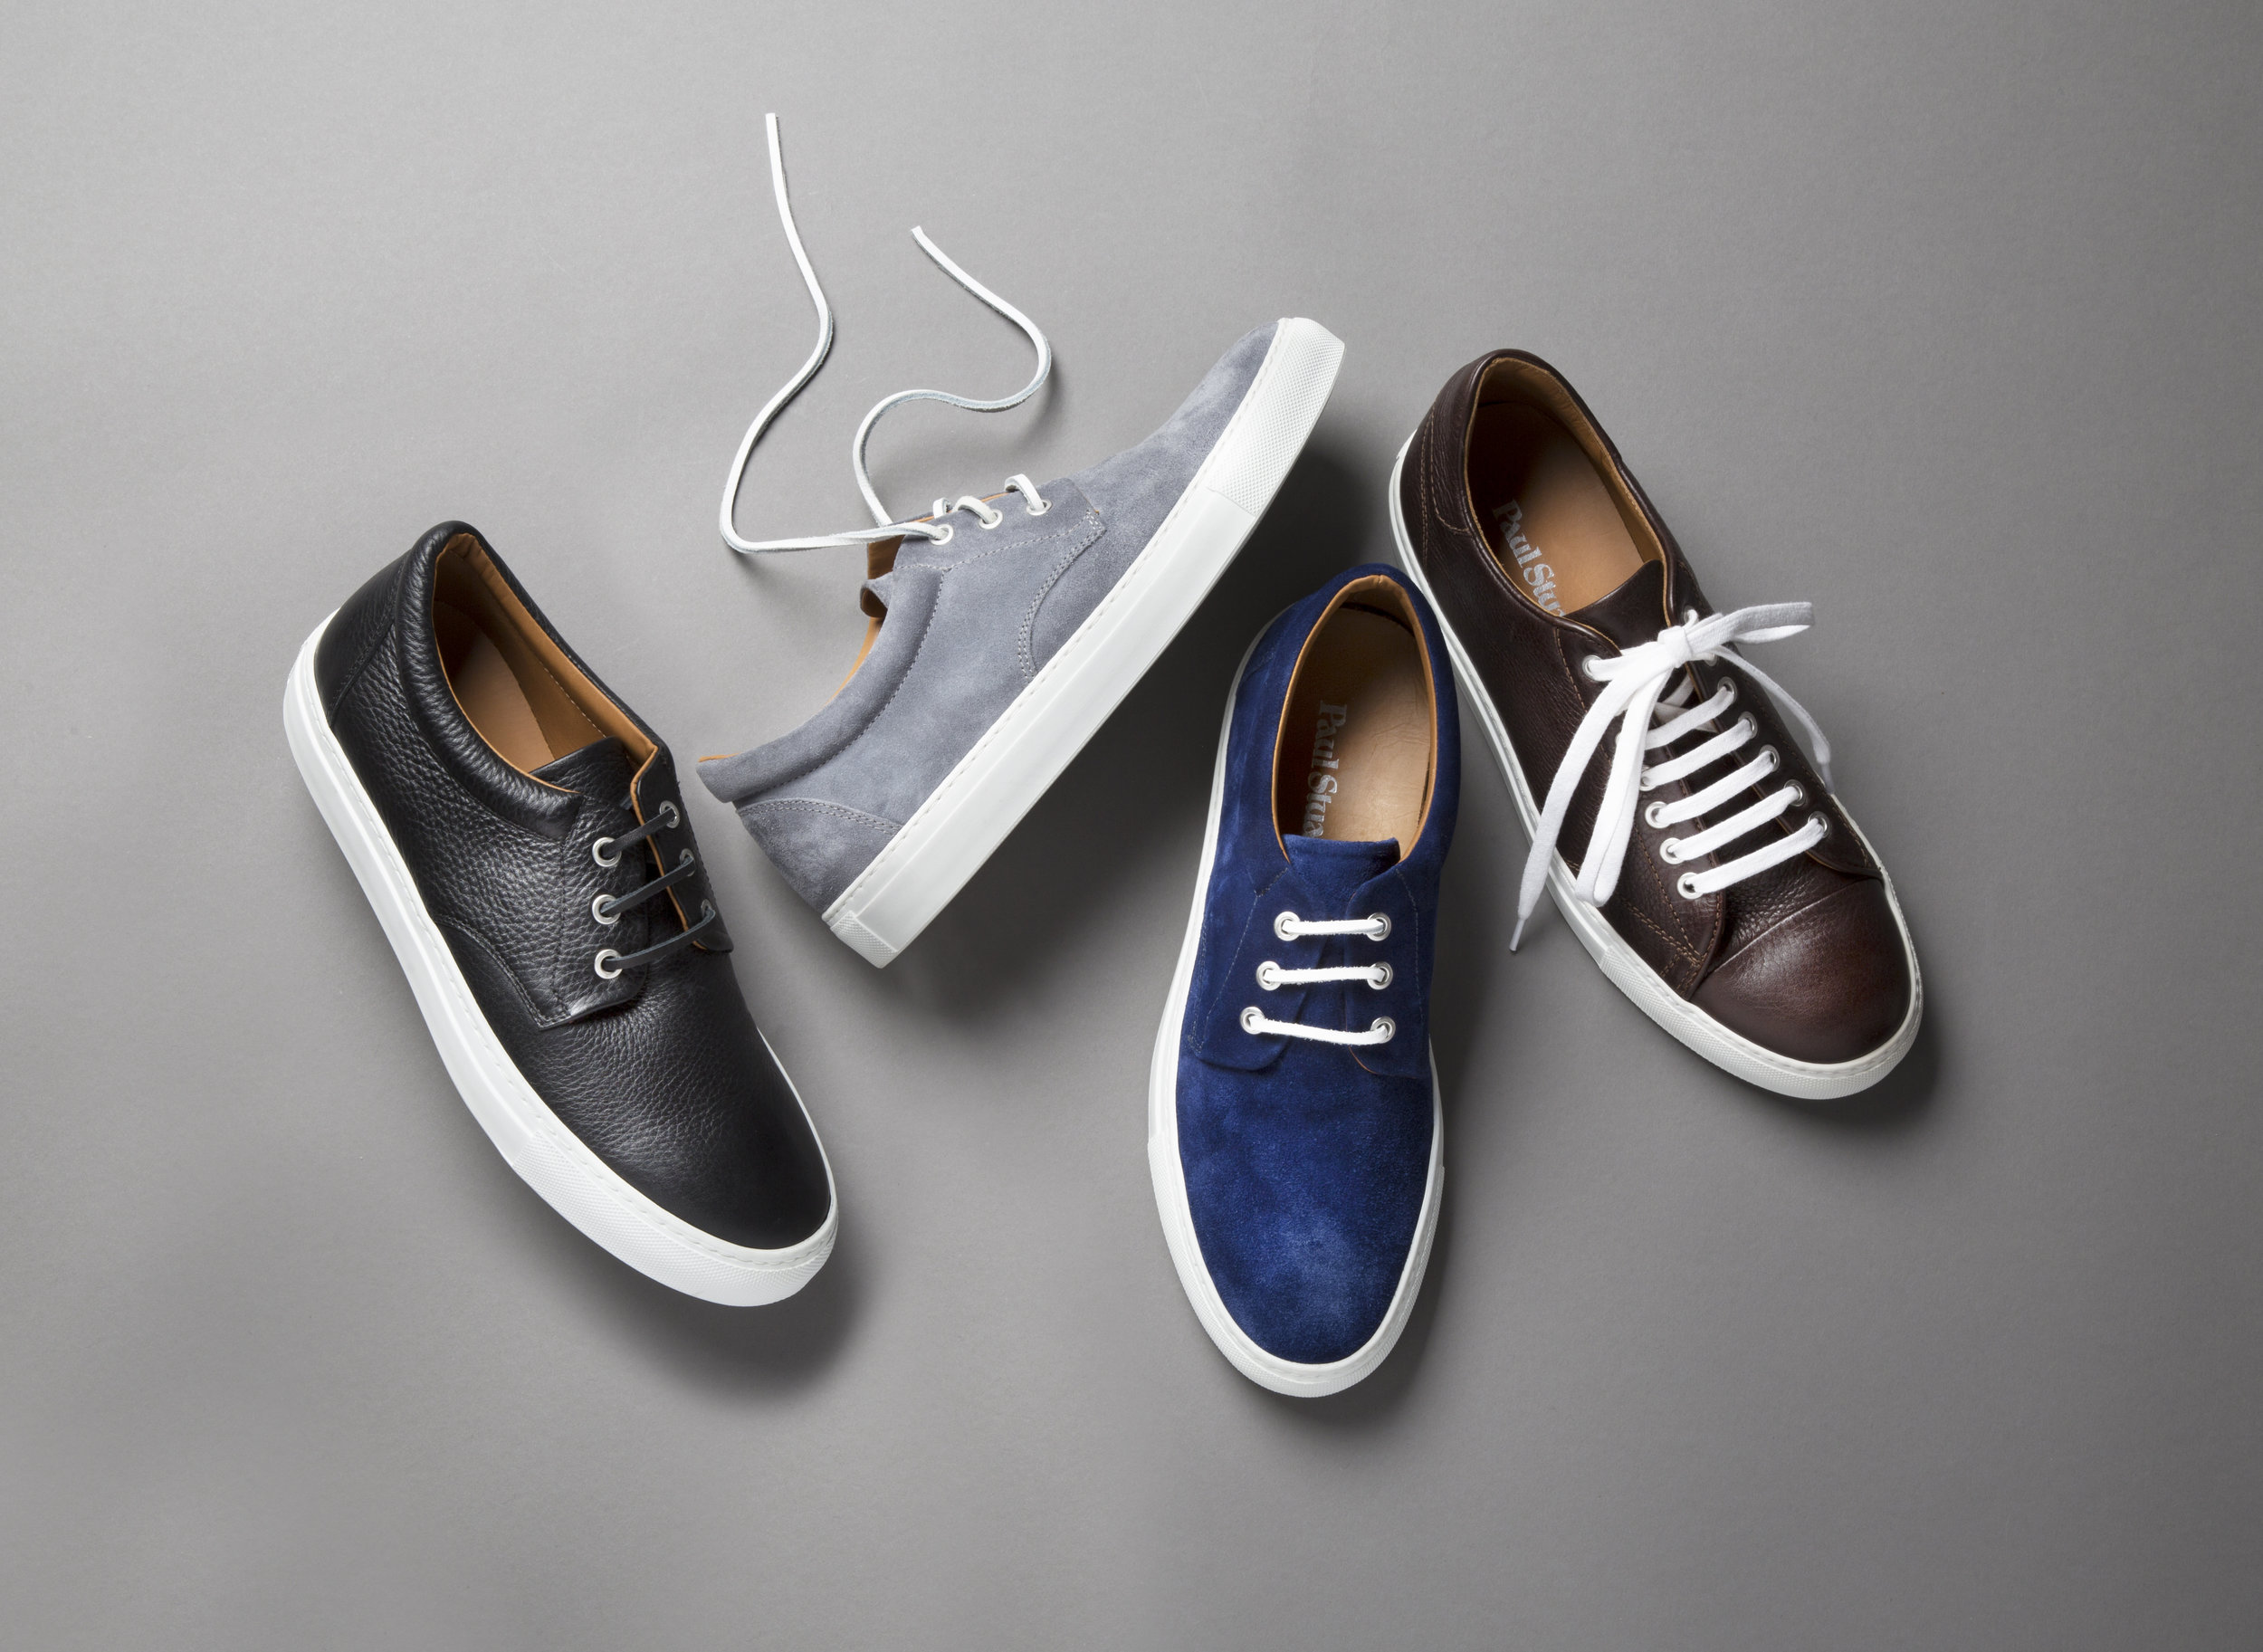 20170112-SALE-blast-Shoes copy.jpg